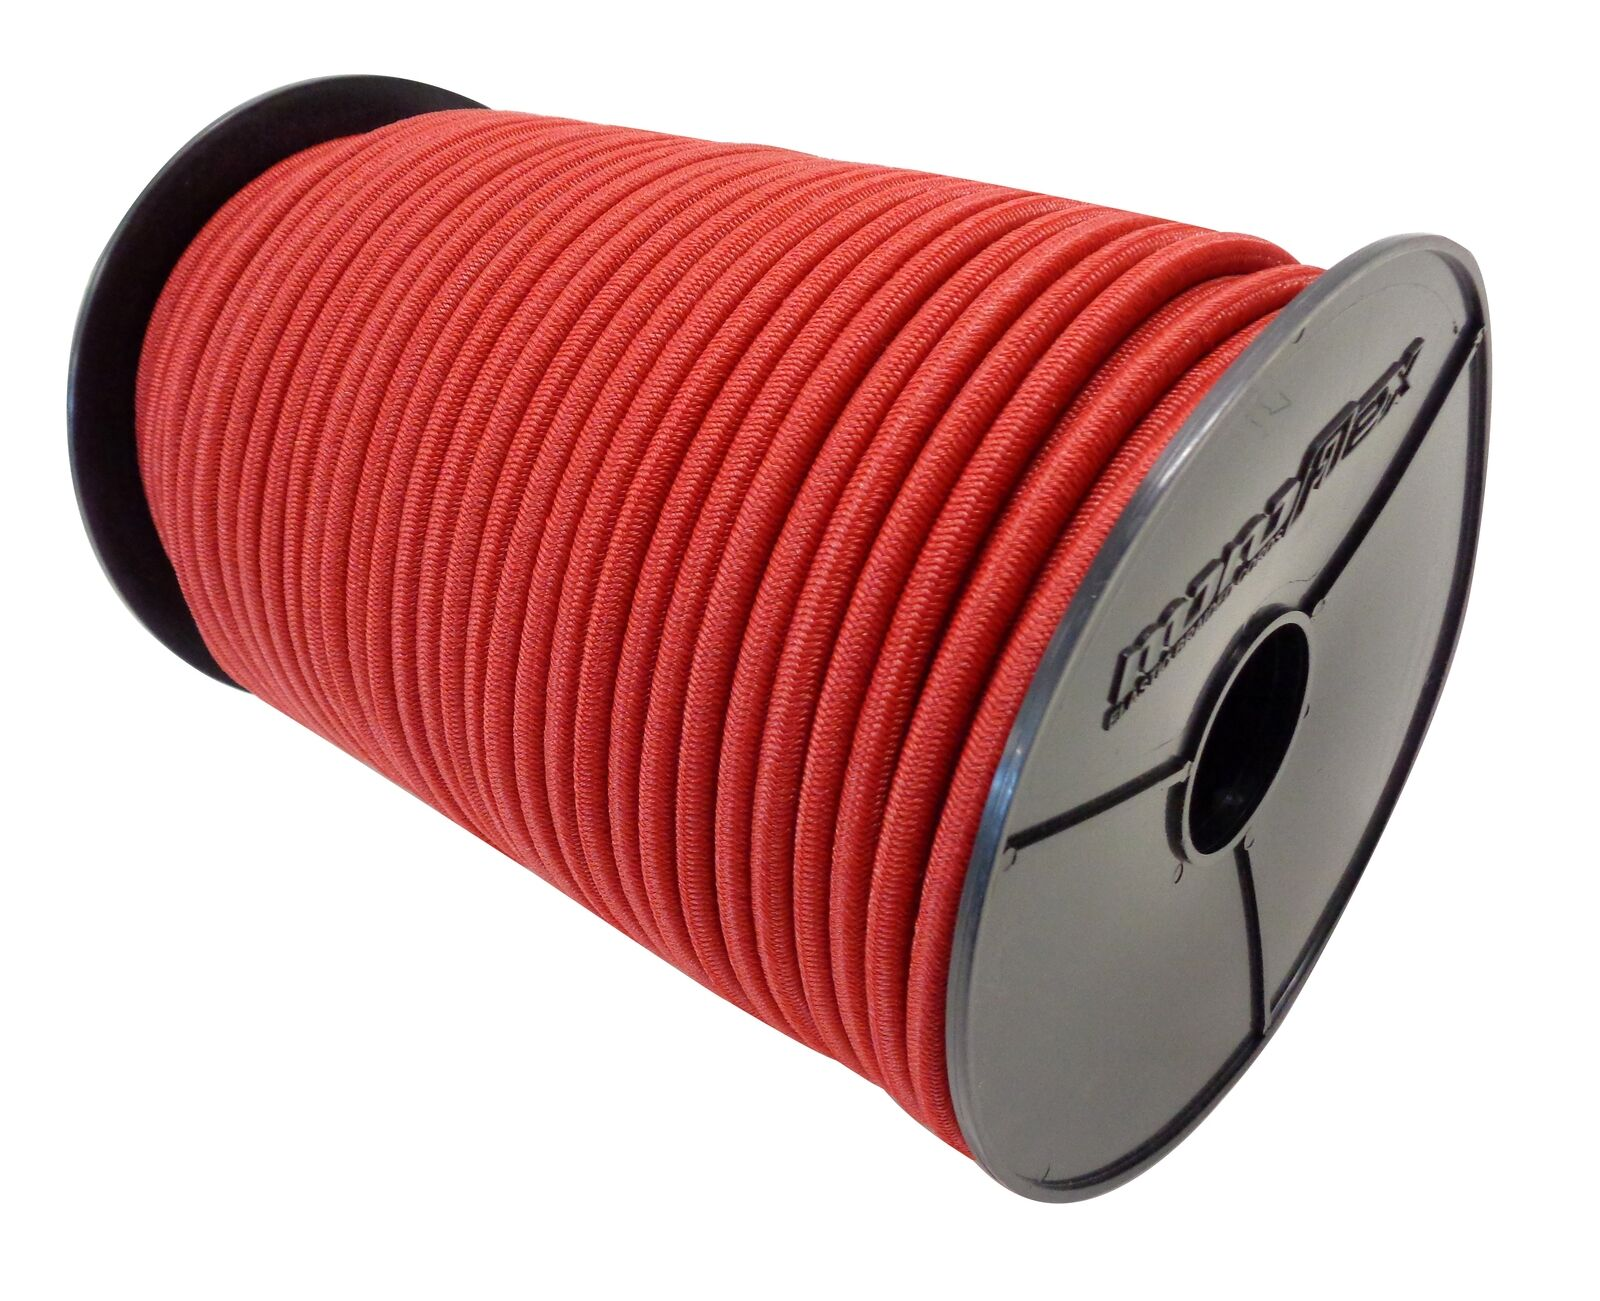 Expanderseil Gummiseil mit PE Mantel in Rot Gummileine Gummileine Rot Planenseil Seil Plane bcb89d